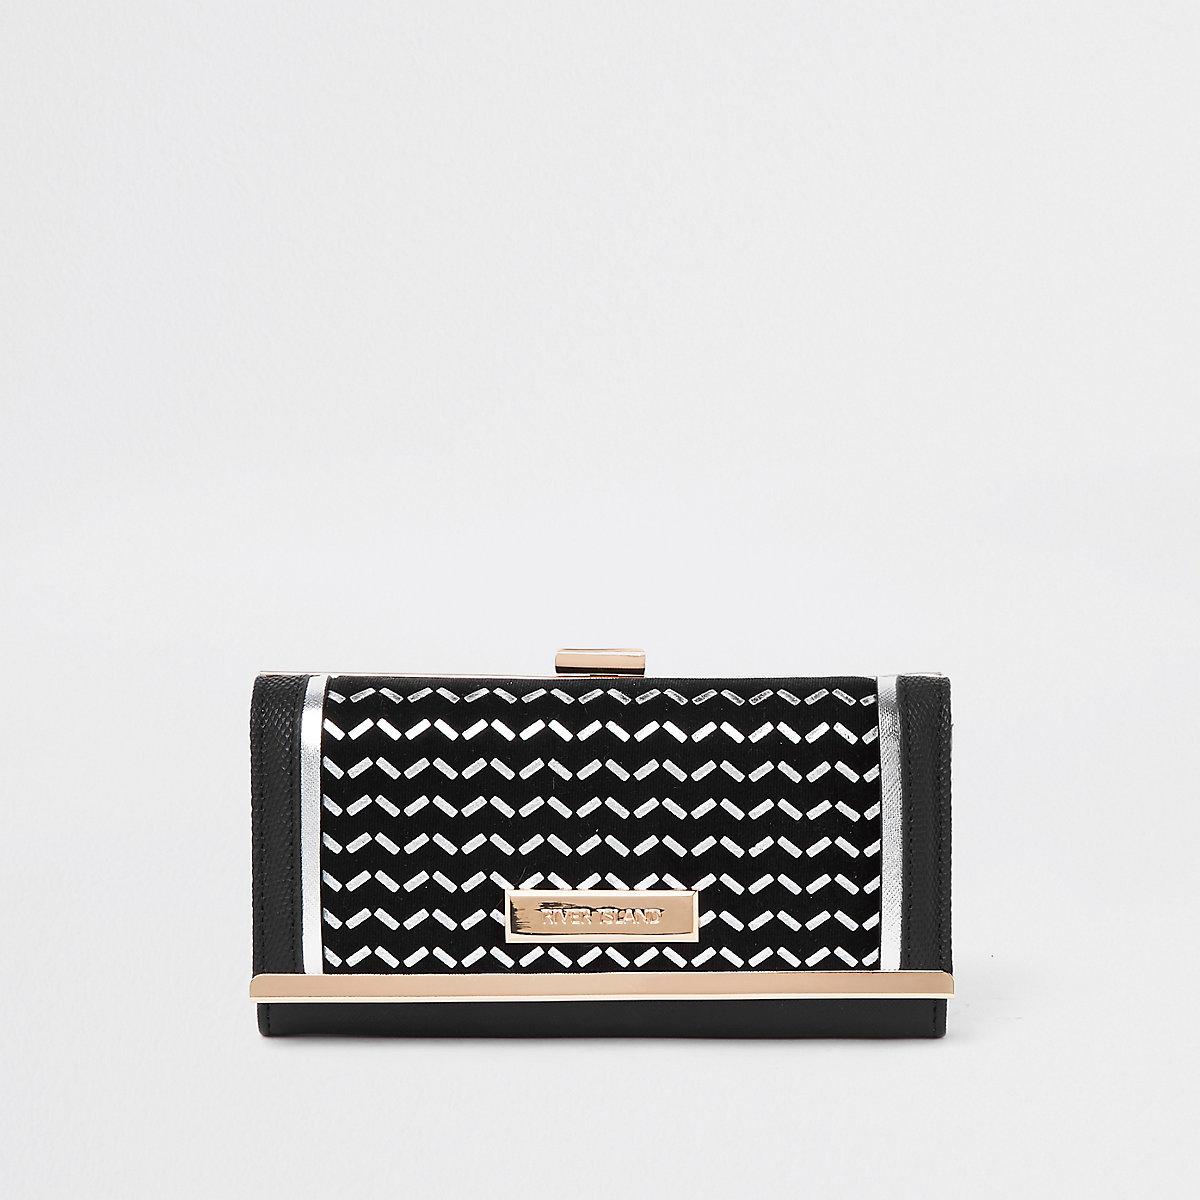 Black silver foil cliptop purse